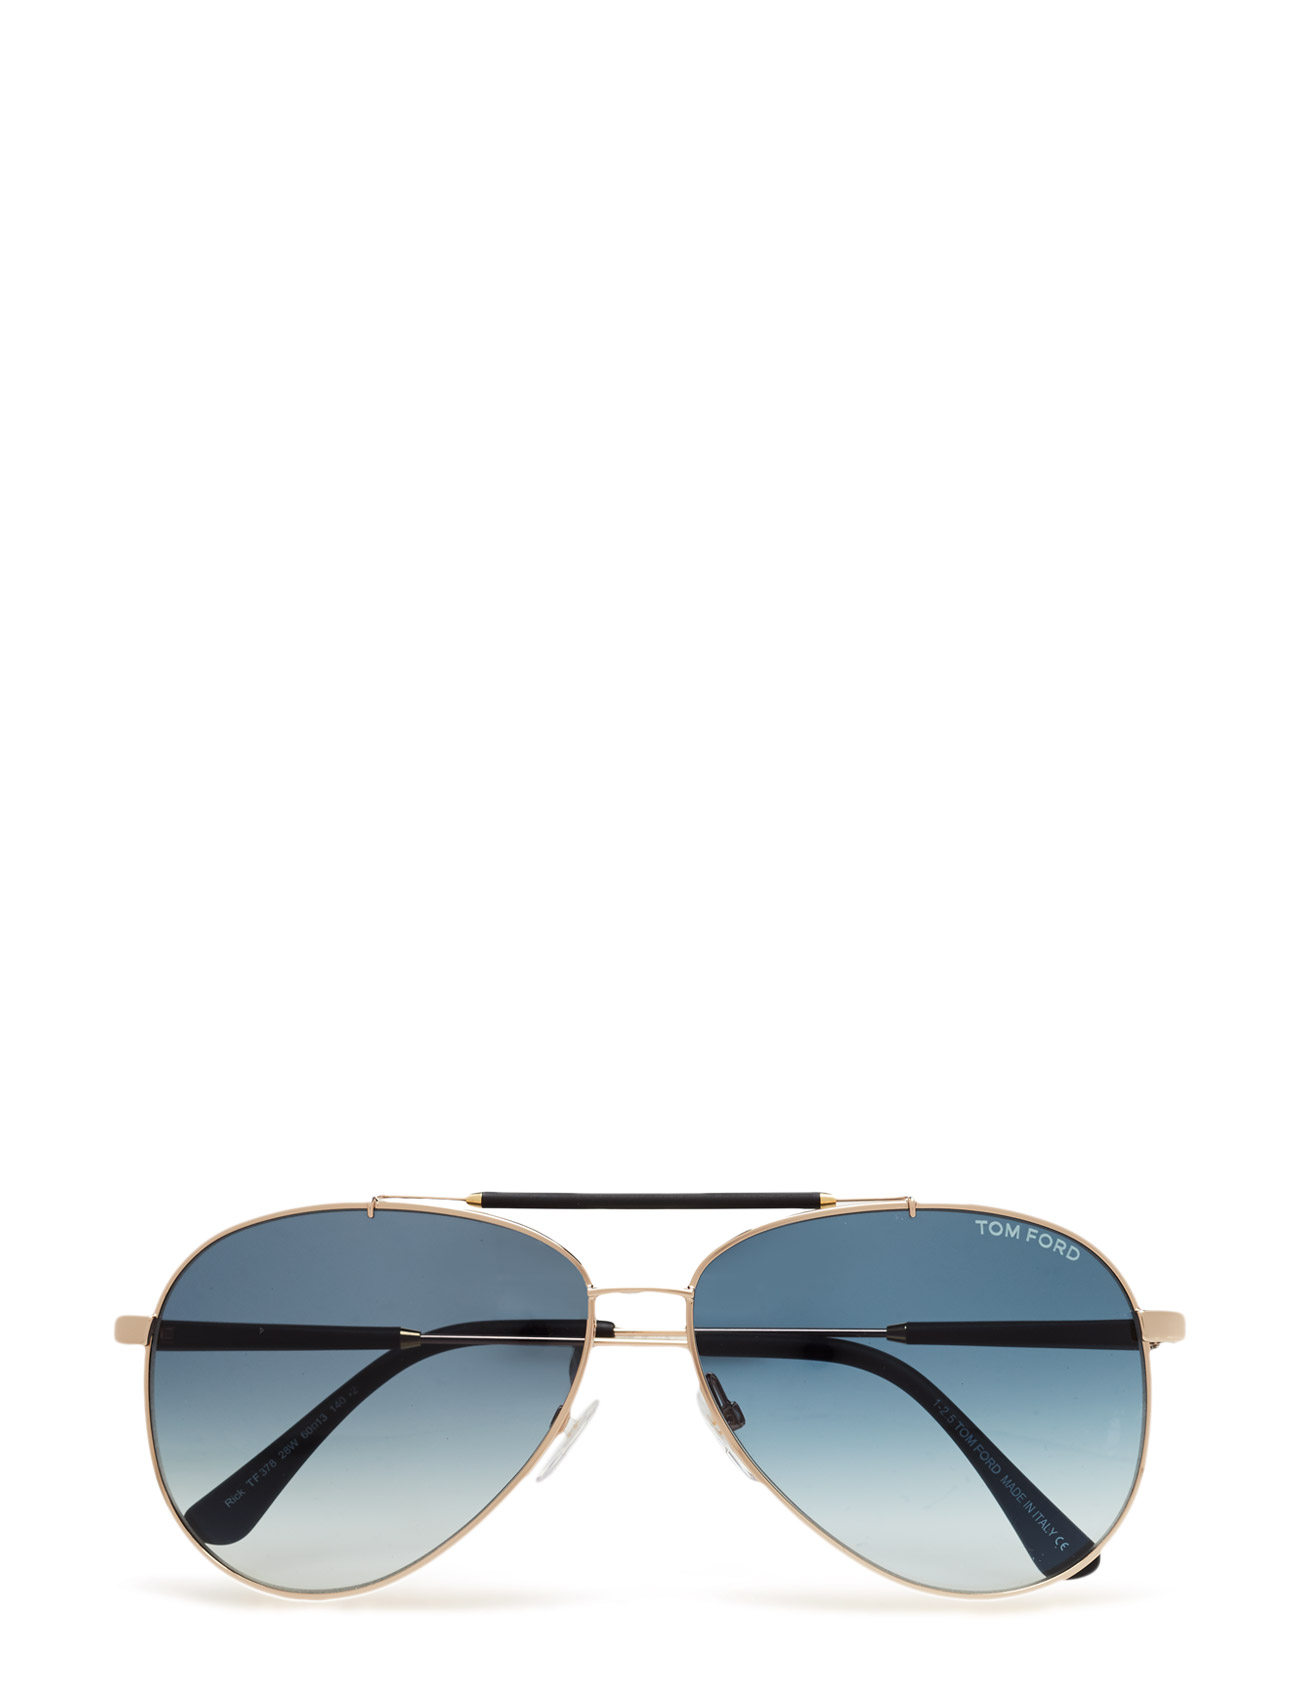 Tom Ford Rick Tom Ford Sunglasses Solbriller til Herrer i